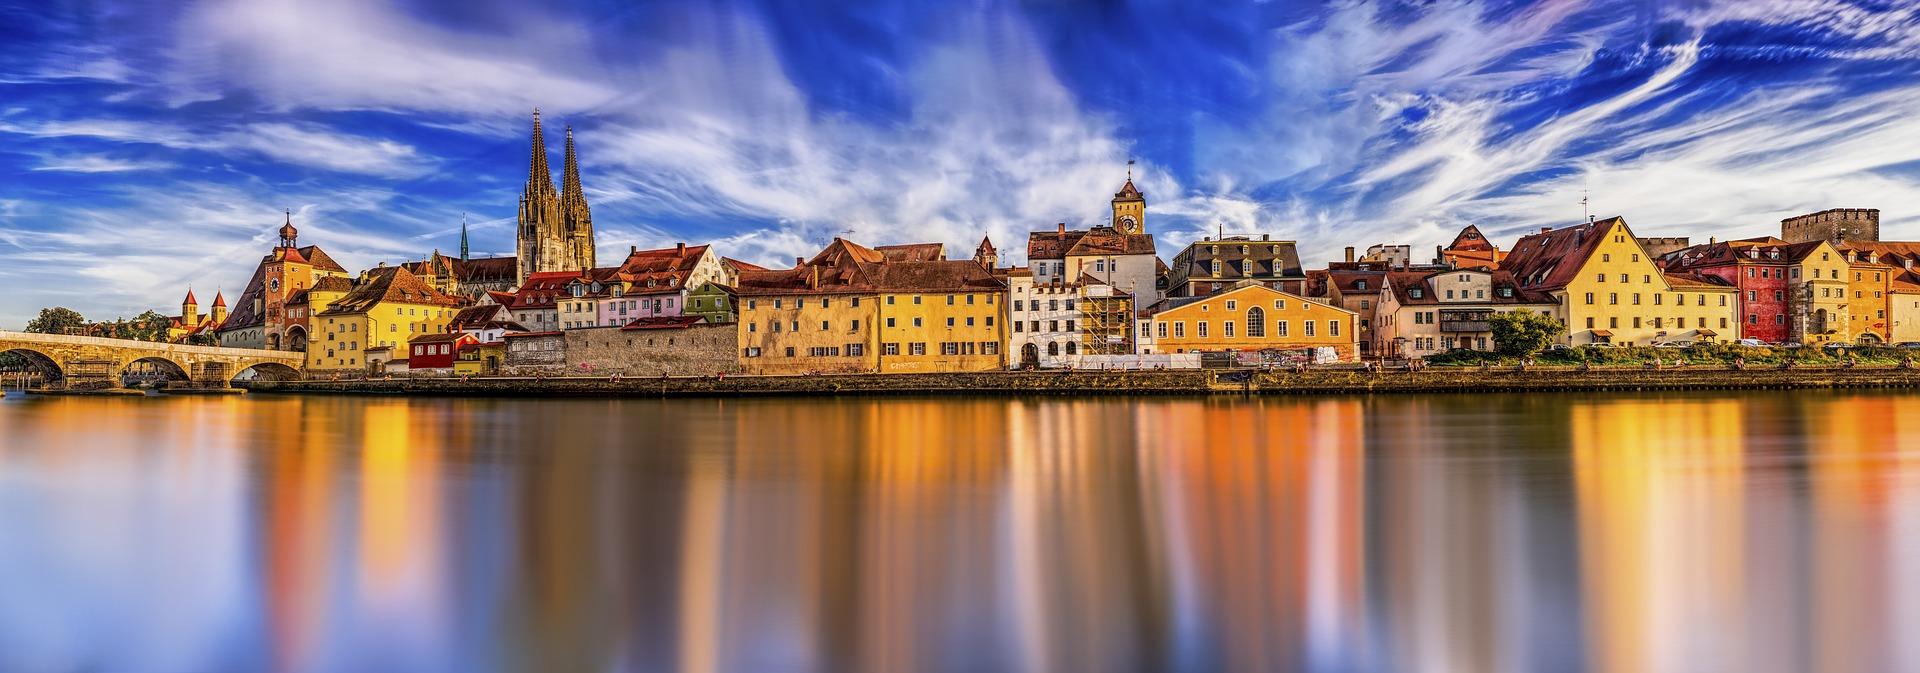 Regensburg, history trip, tour, German